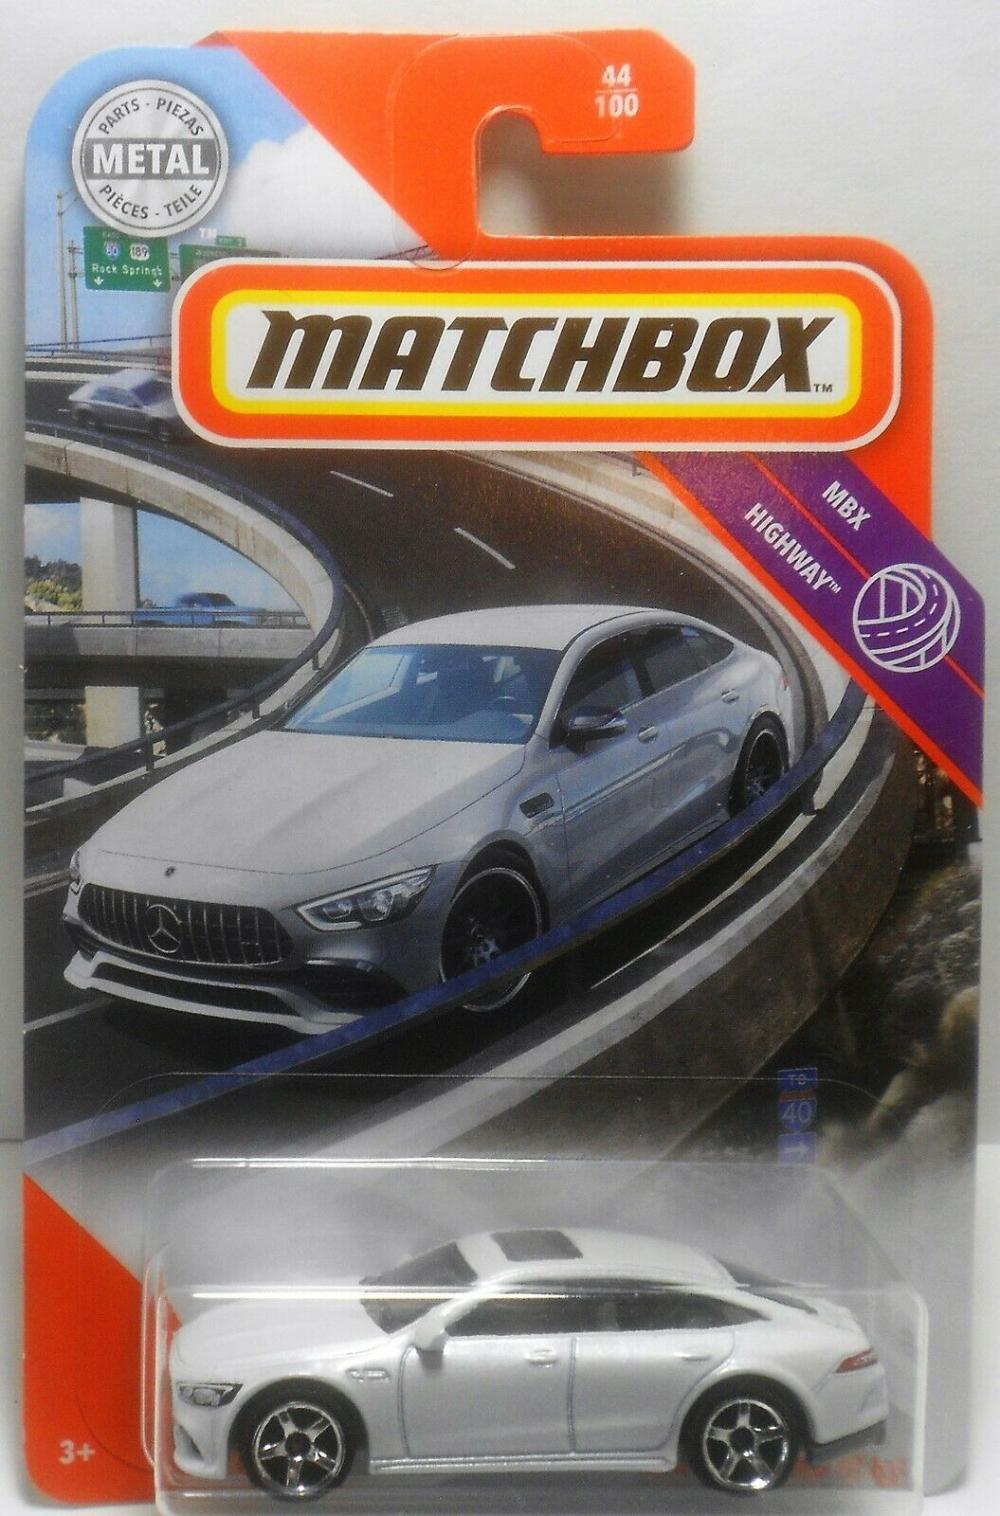 MATCHBOX 2020 MERCEDESAMG GT 63 S NEW MODEL HIGHWAY 44